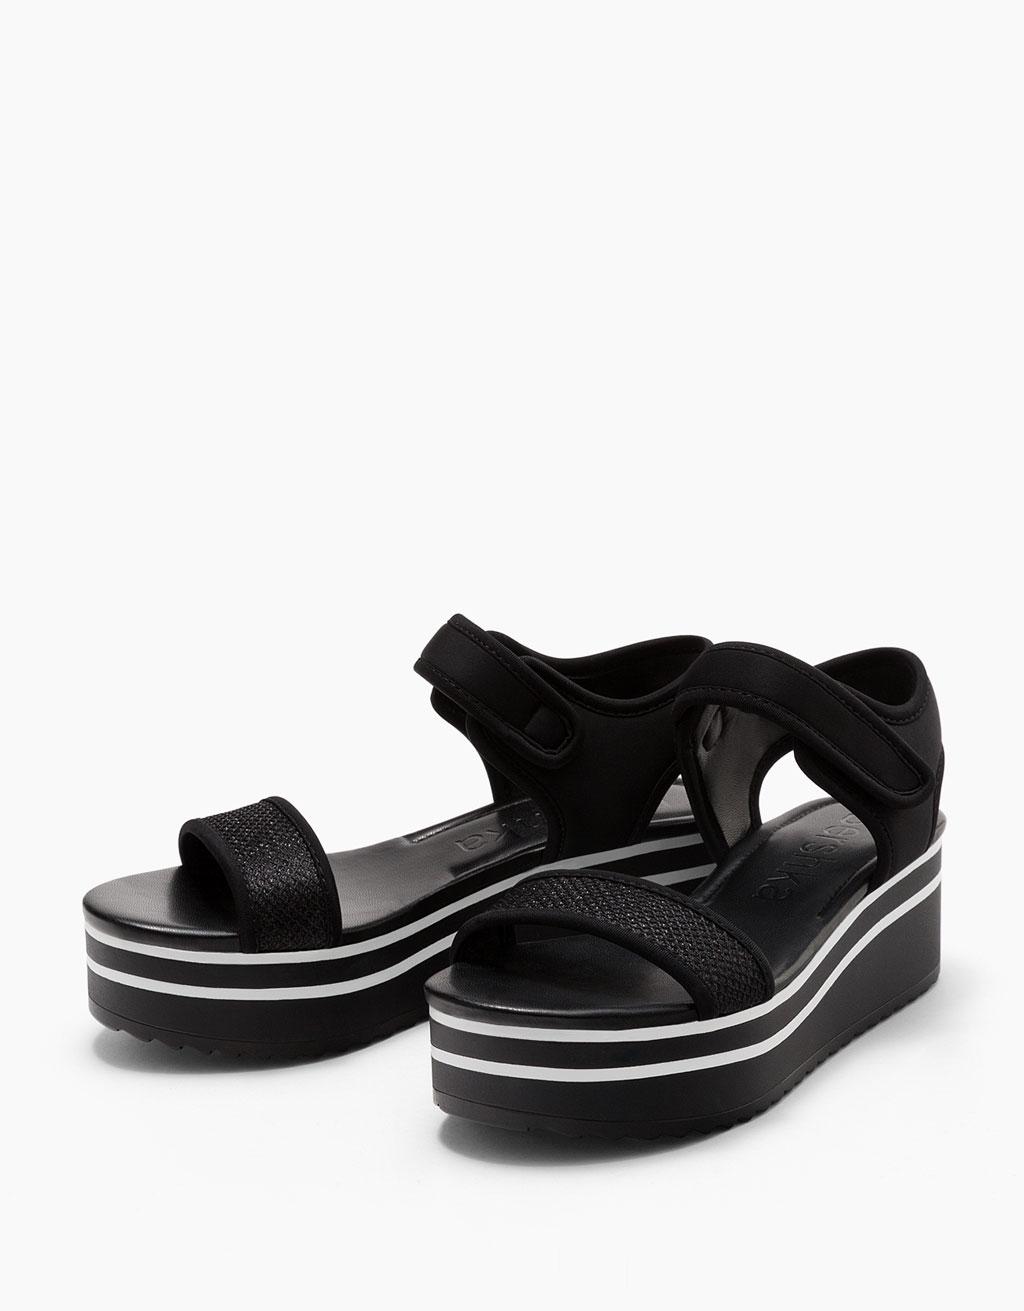 Platform sandals with shiny straps